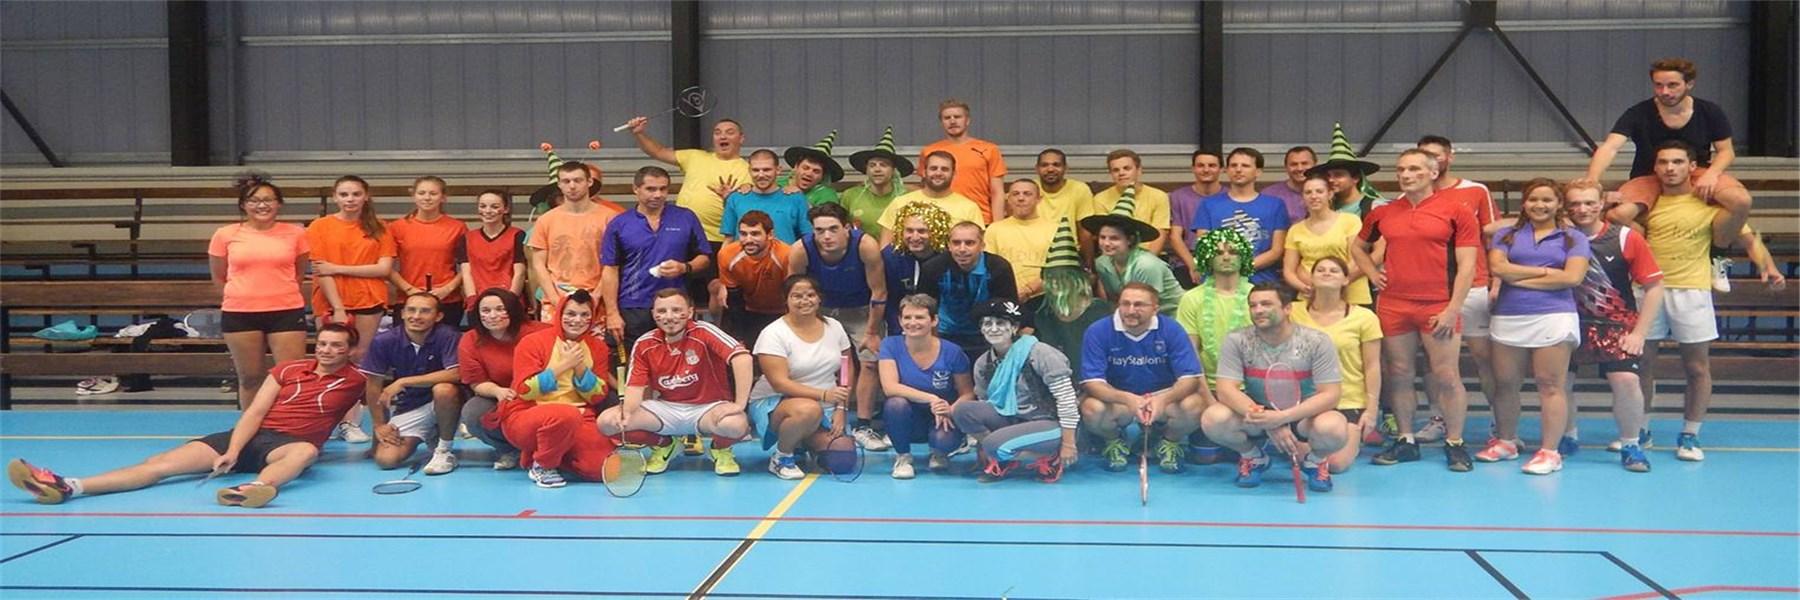 Bondoufle Amical Club Badminton